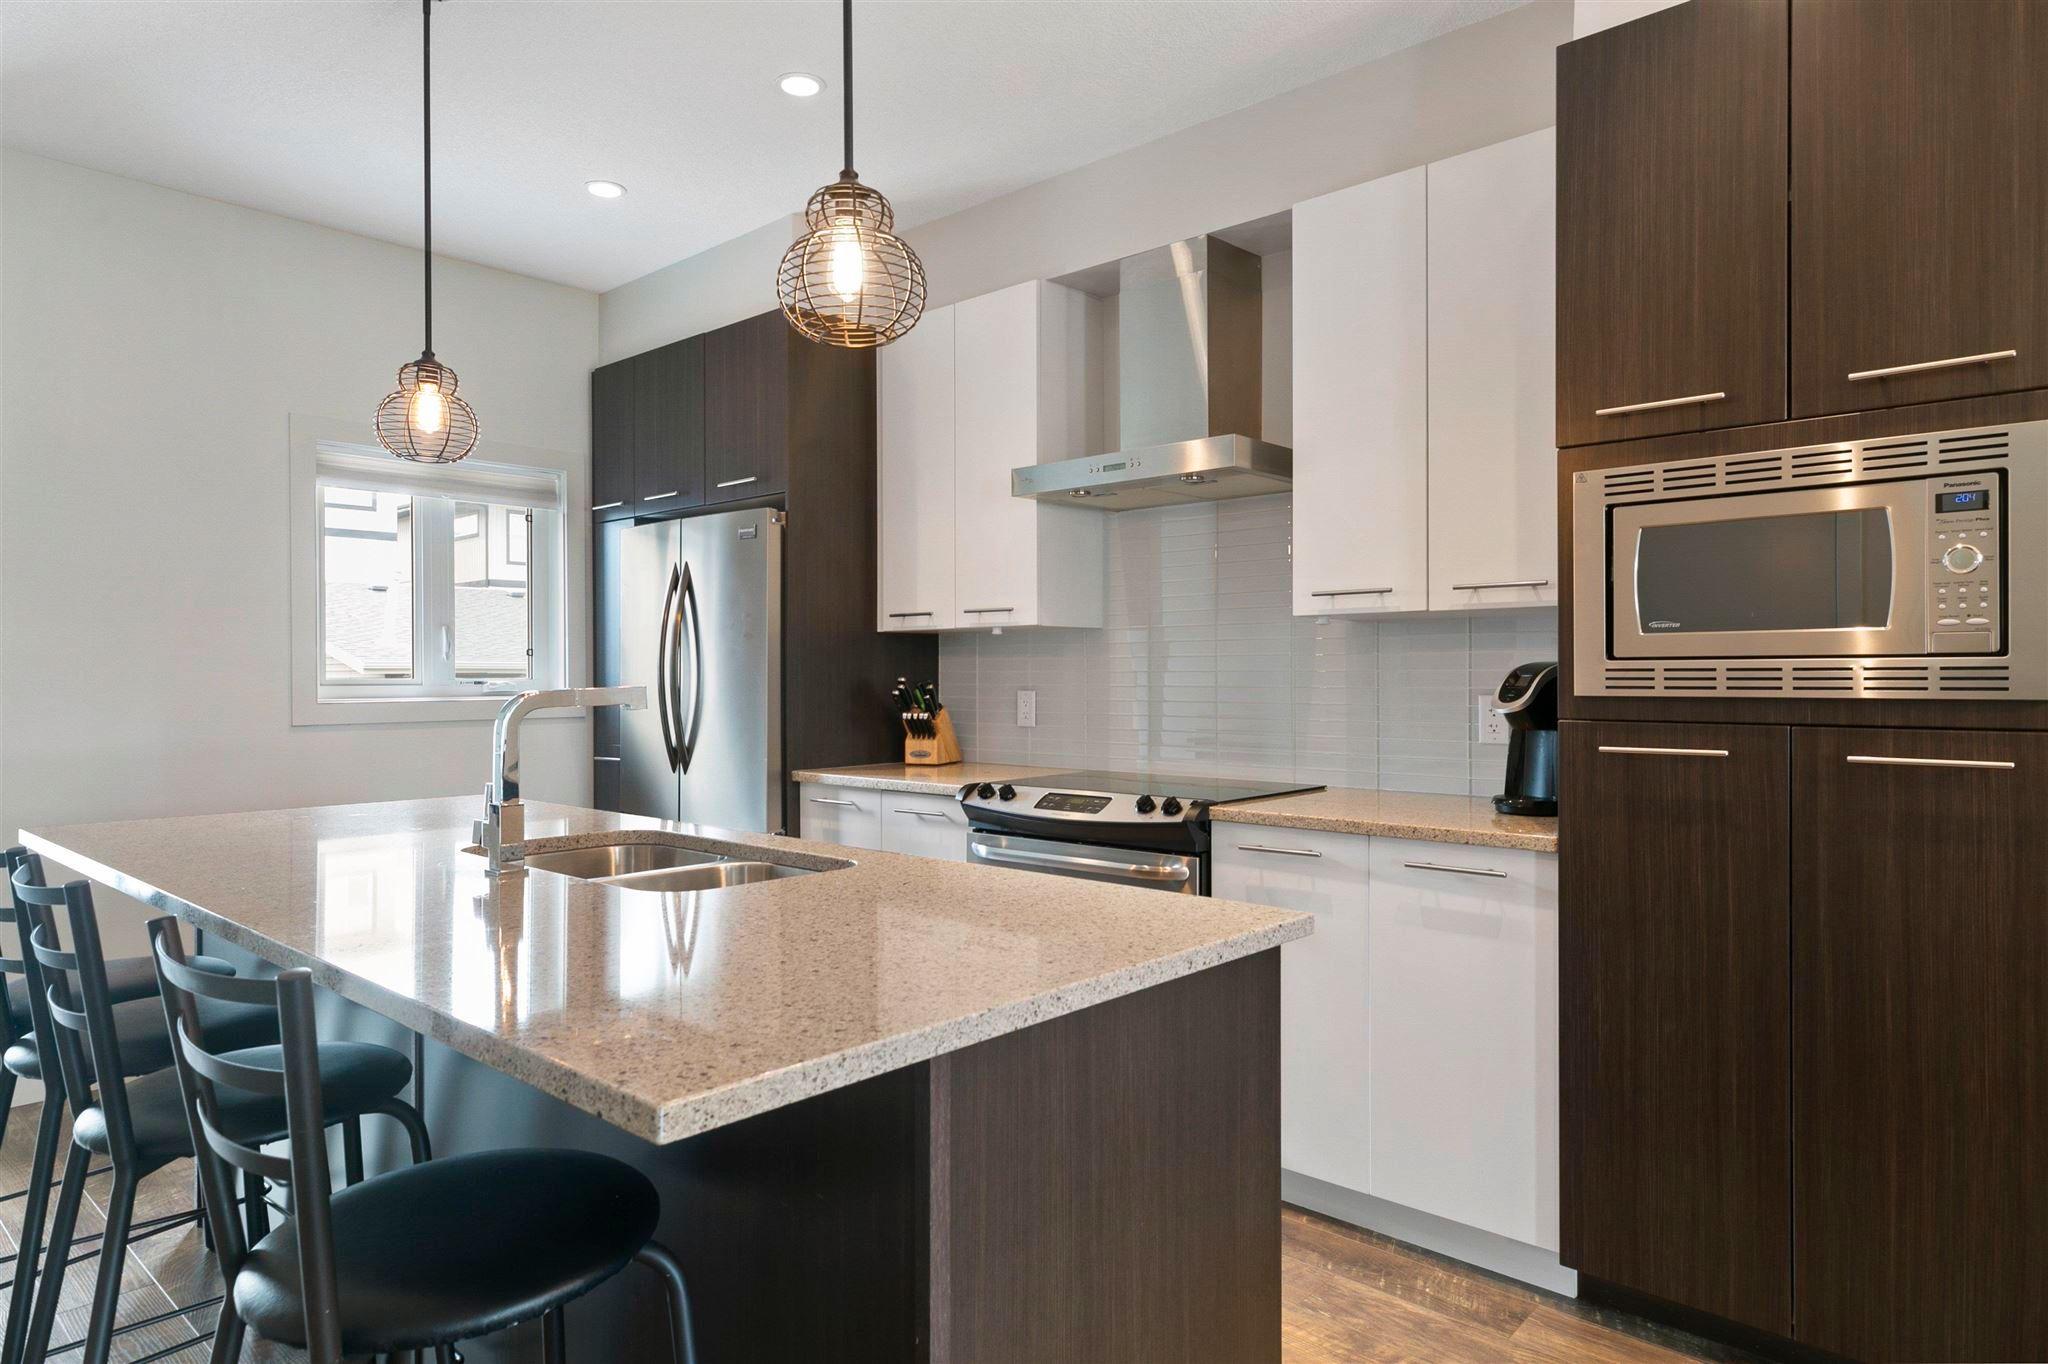 Main Photo: 15 KENTON Way: Spruce Grove House for sale : MLS®# E4255085